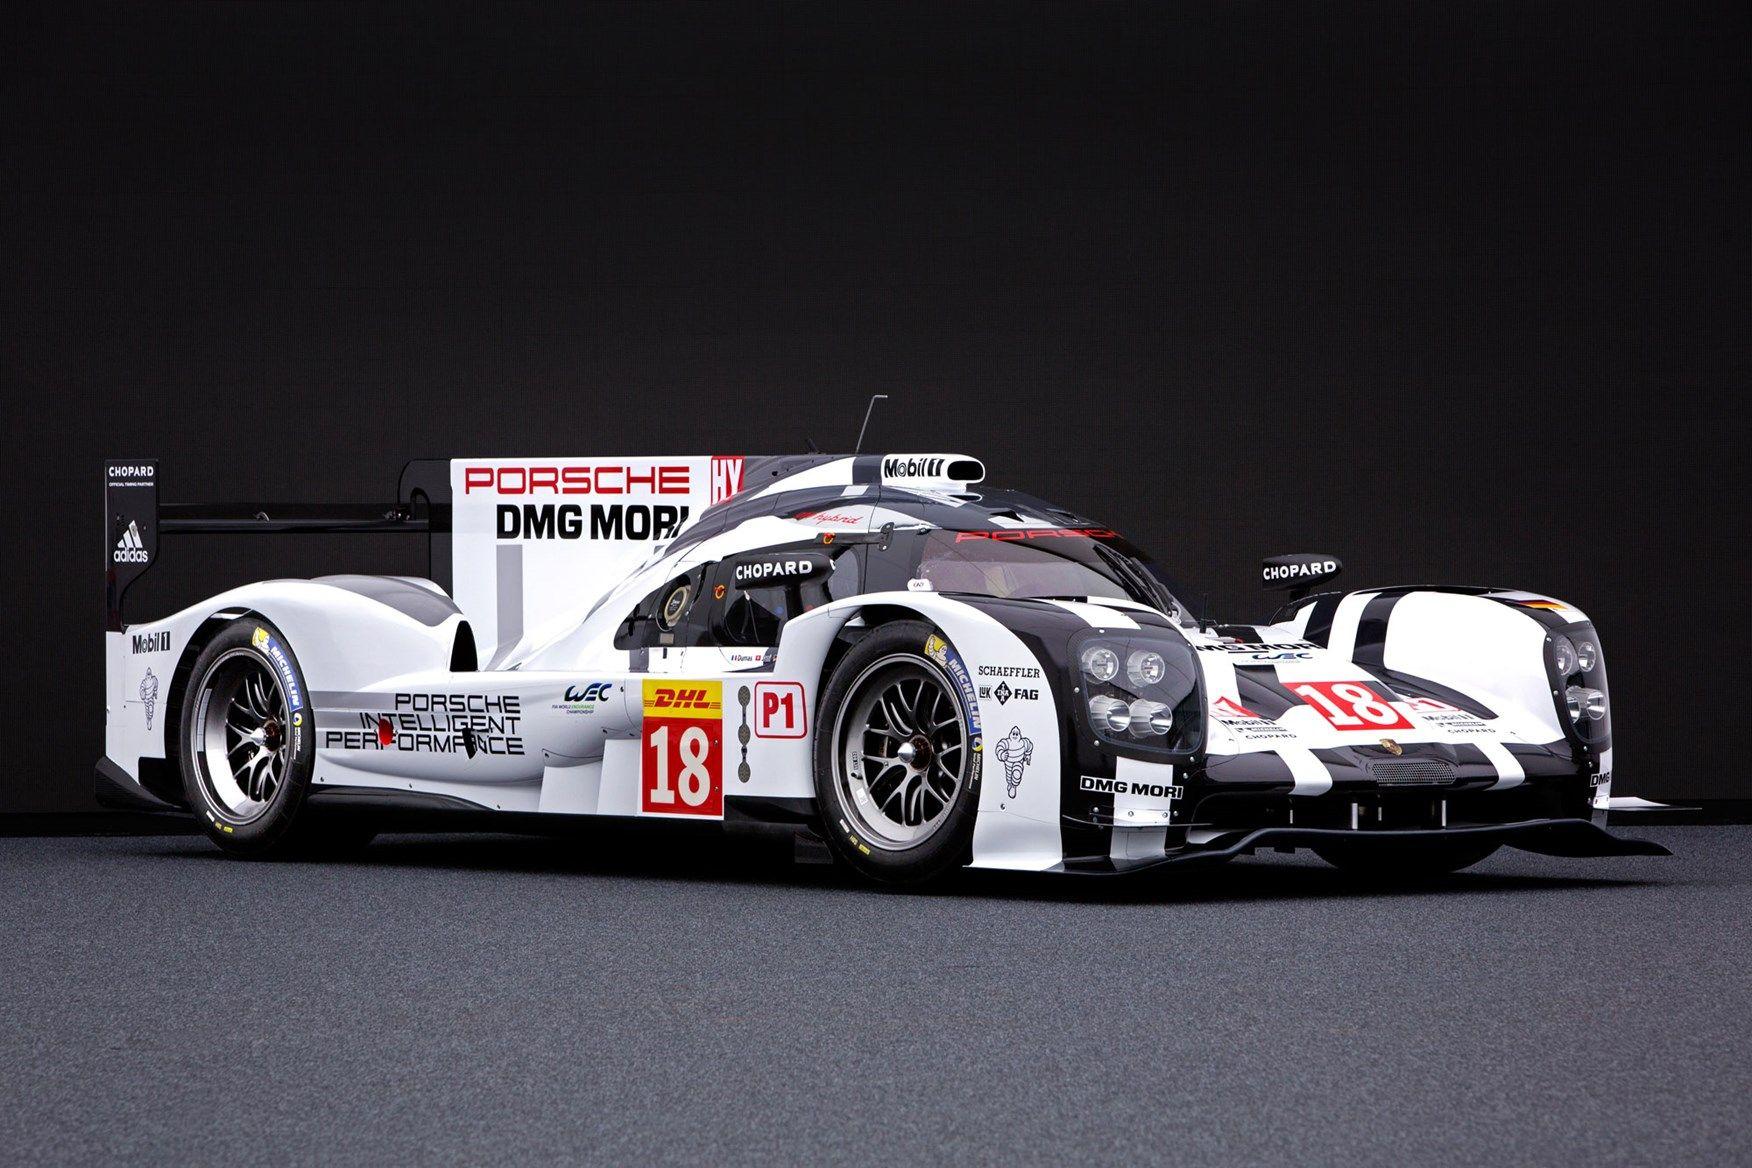 1f101bbbb18bbfa8ae16aacc77945f9f Fascinating Porsche 911 Gt1 Evo 98 Slot It Cars Trend